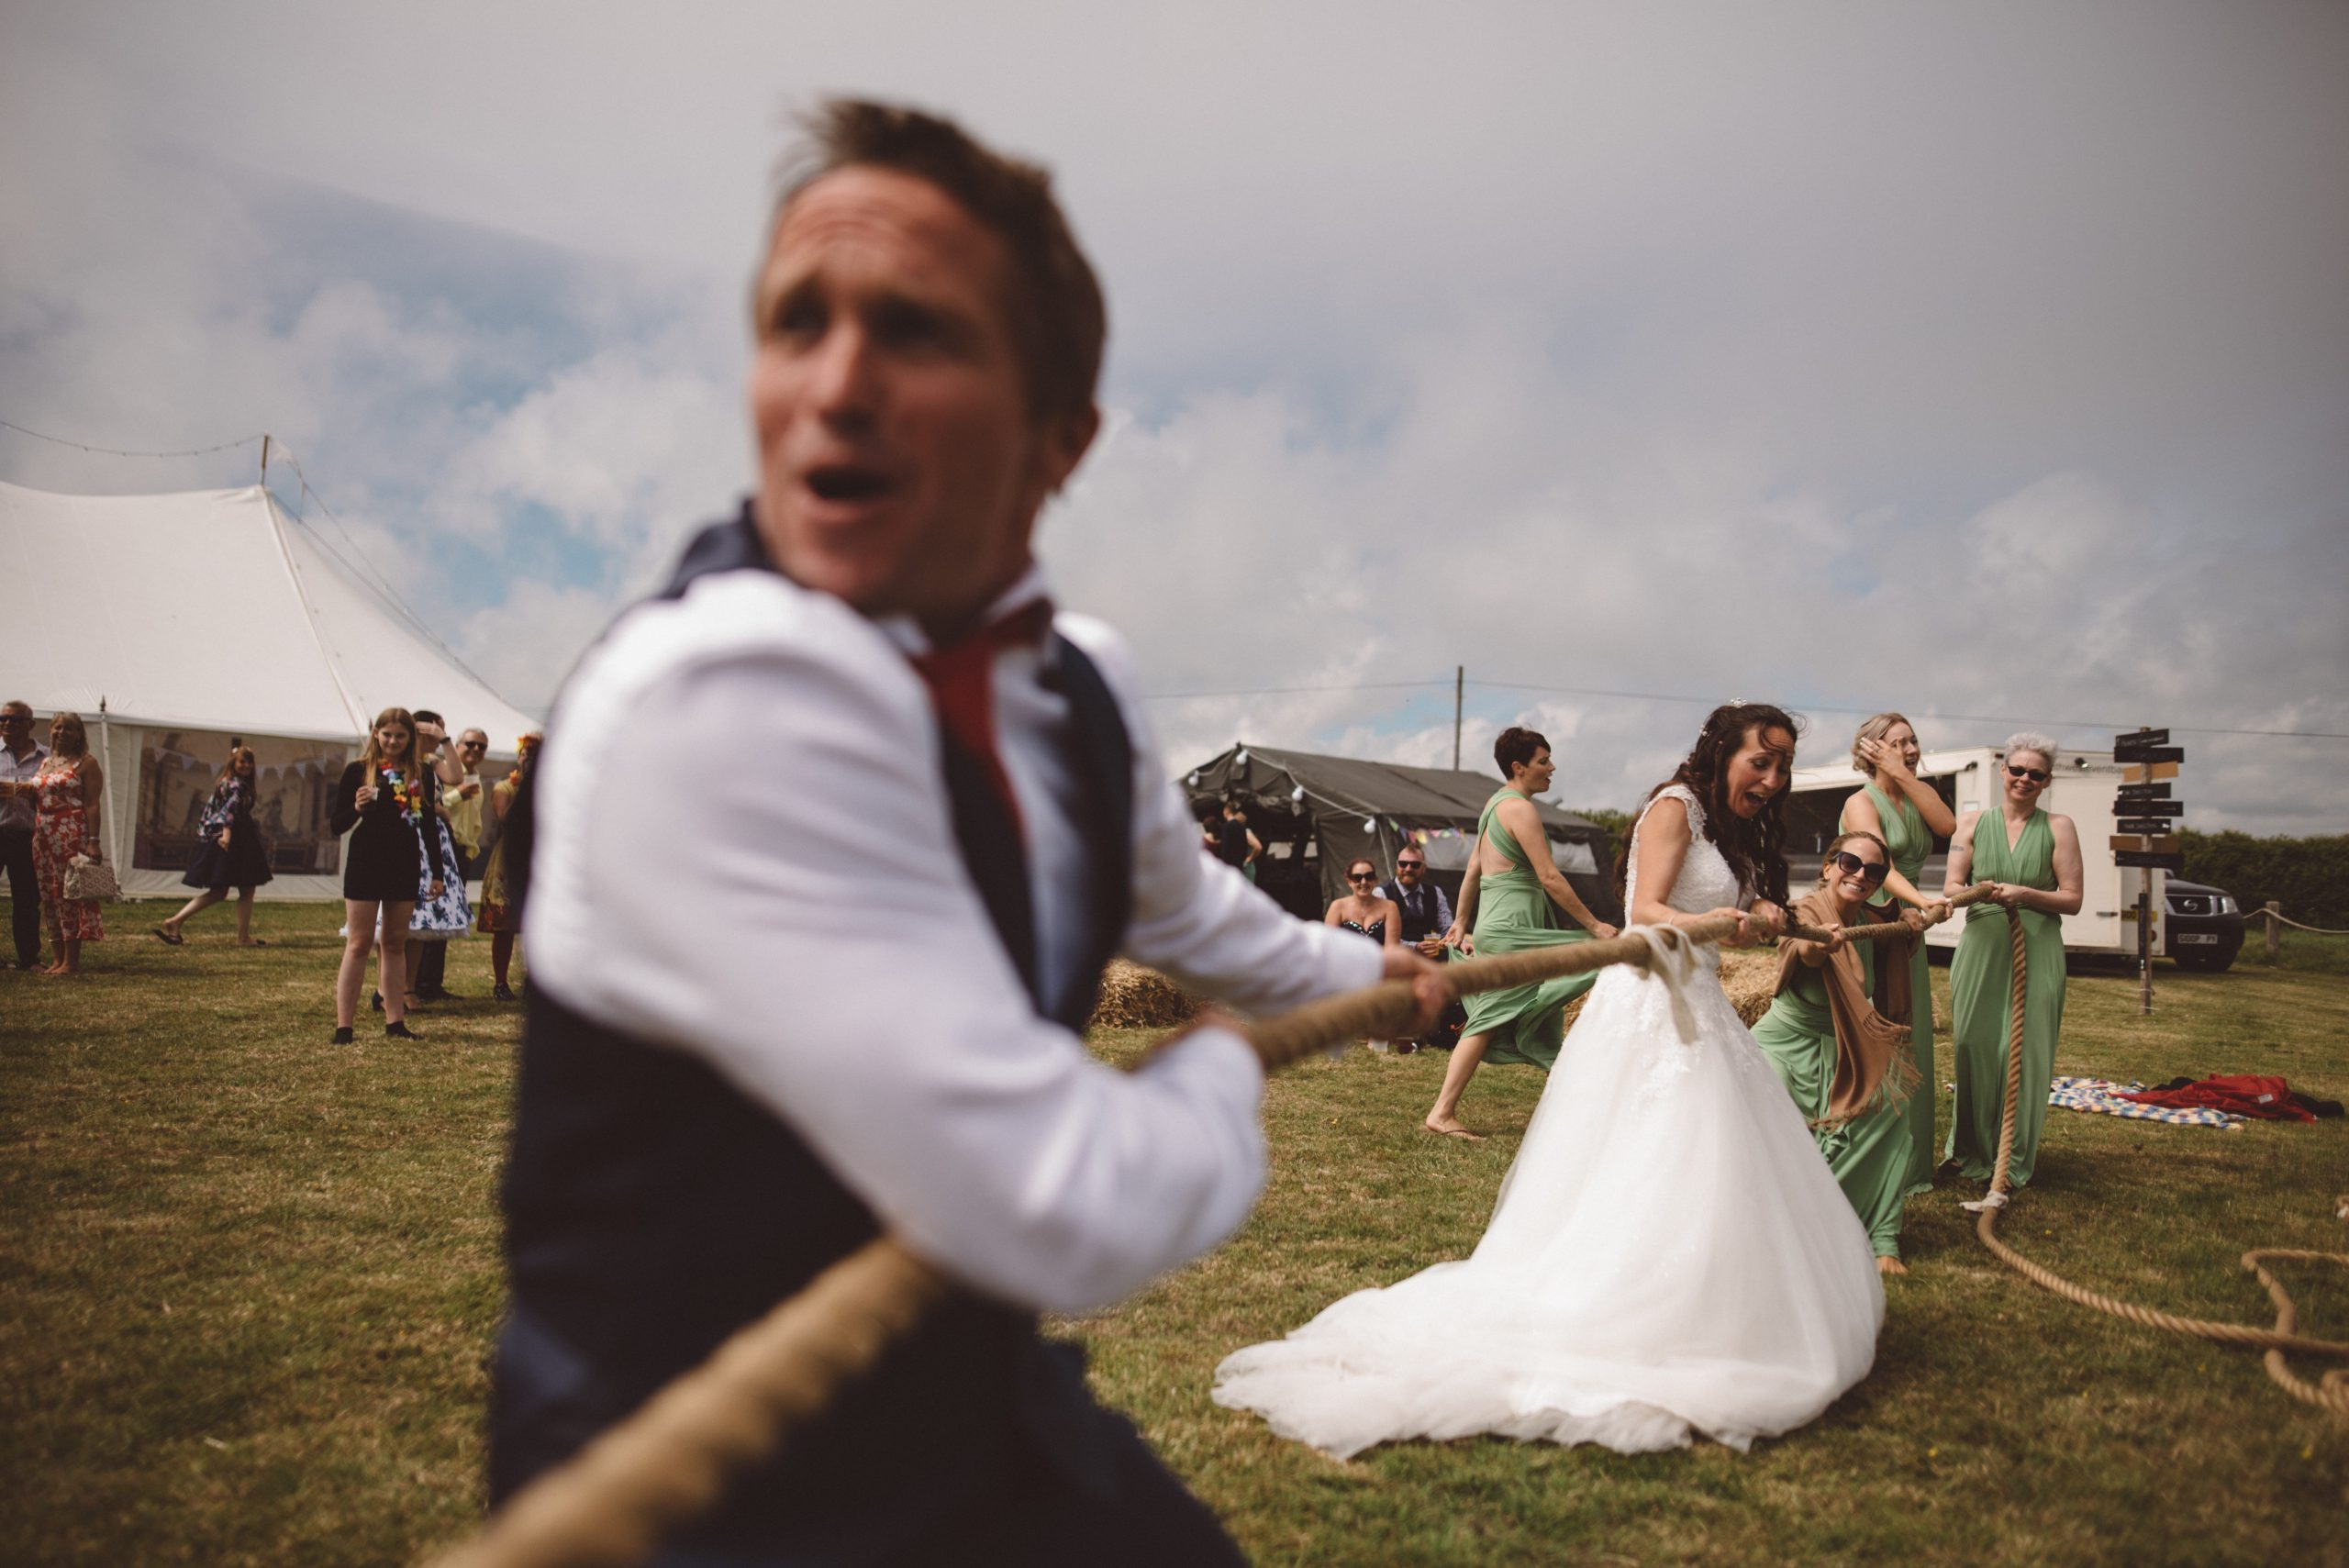 tug of war at Carswell weddings Devon